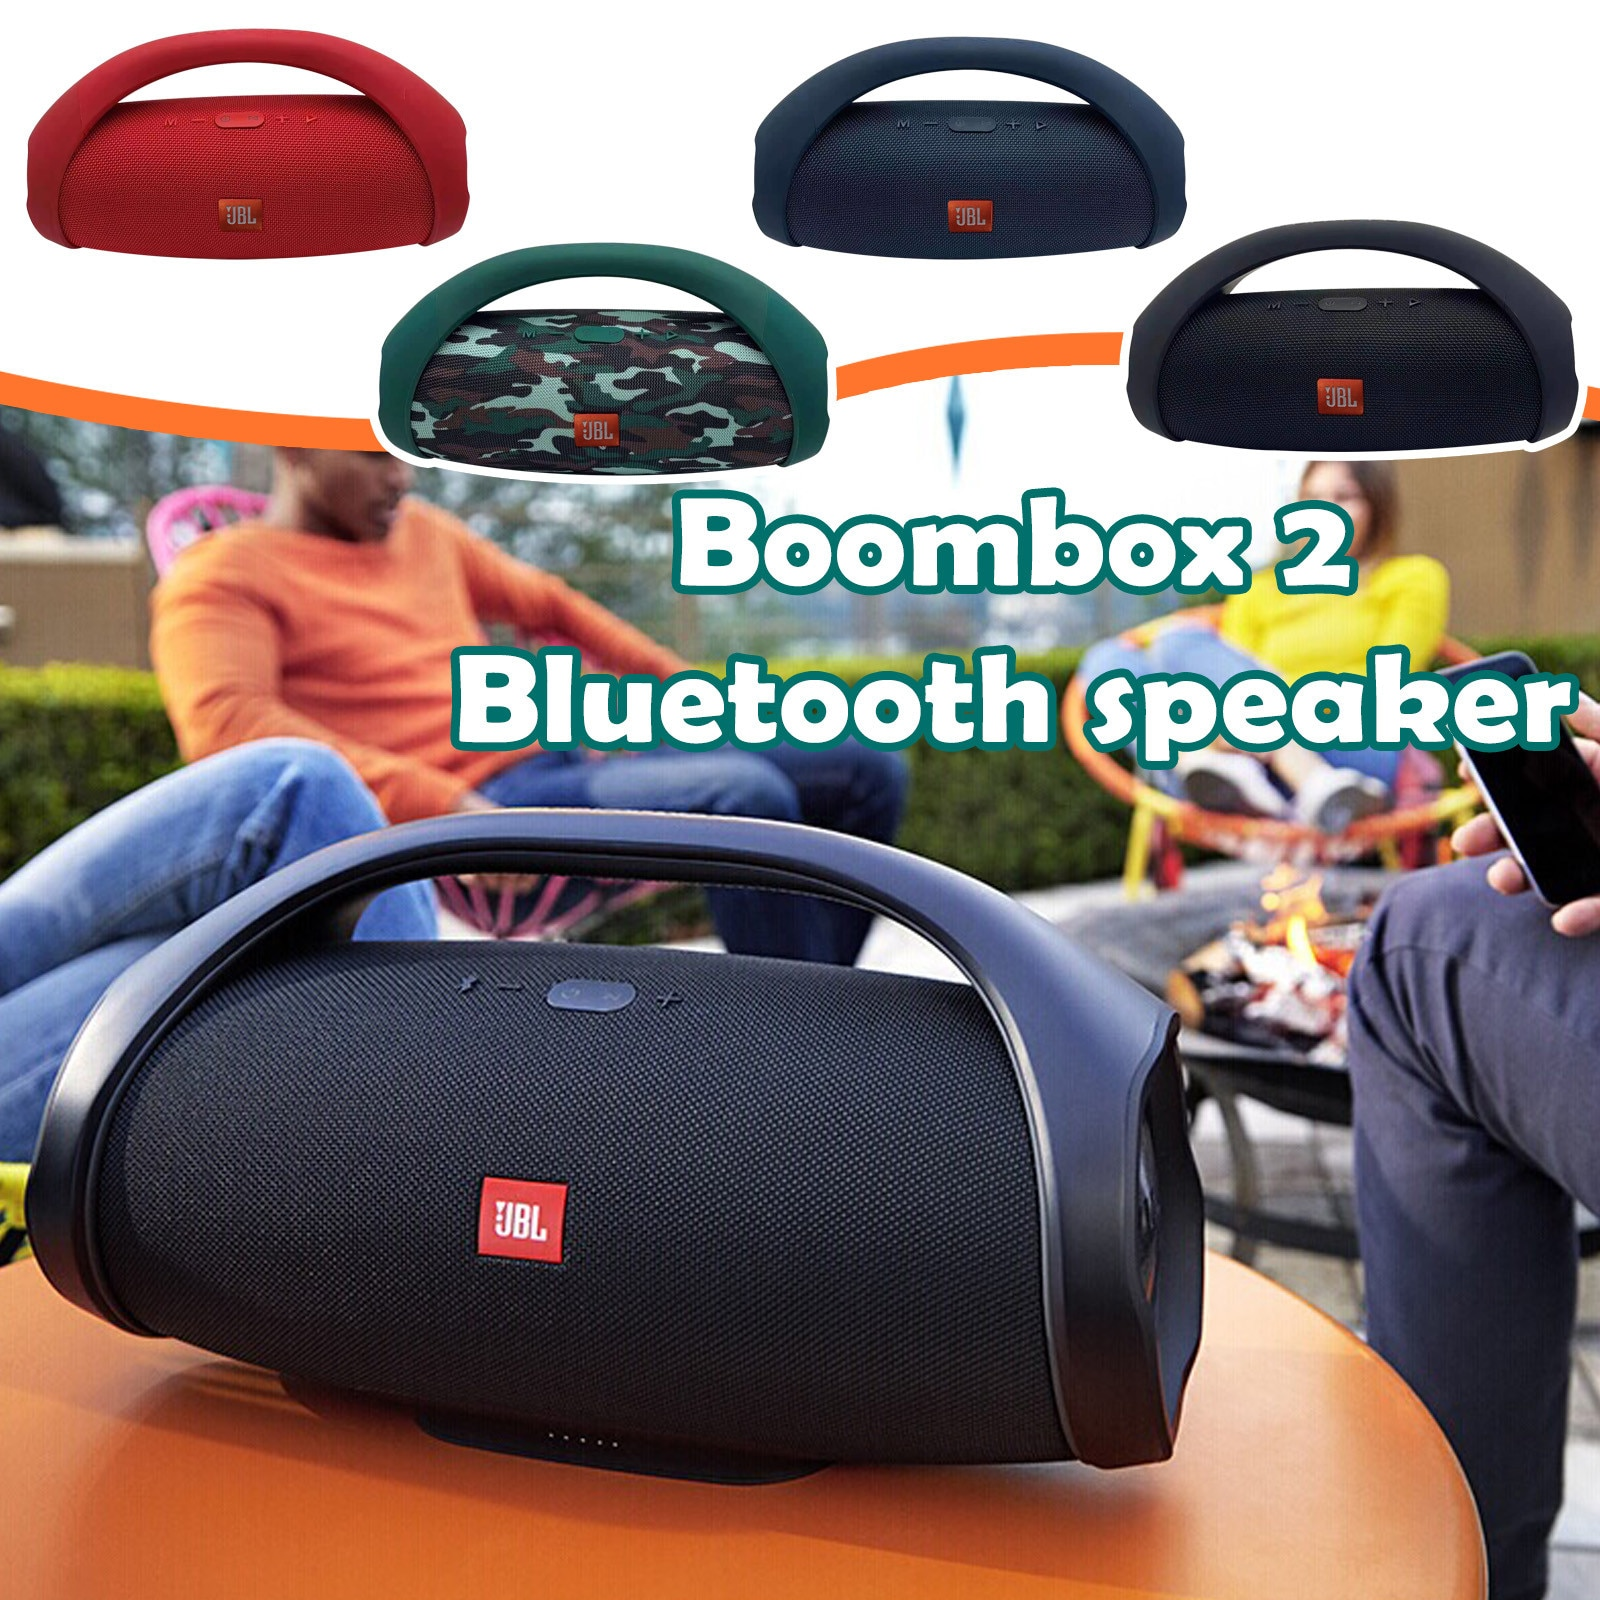 JBL Boombox 2 ميكرفون بلوتوث محمول IPX7 بوم صندوق مقاوم للماء مكبر الصوت ديناميات الموسيقى مضخم صوت ستيريو في الهواء الطلق